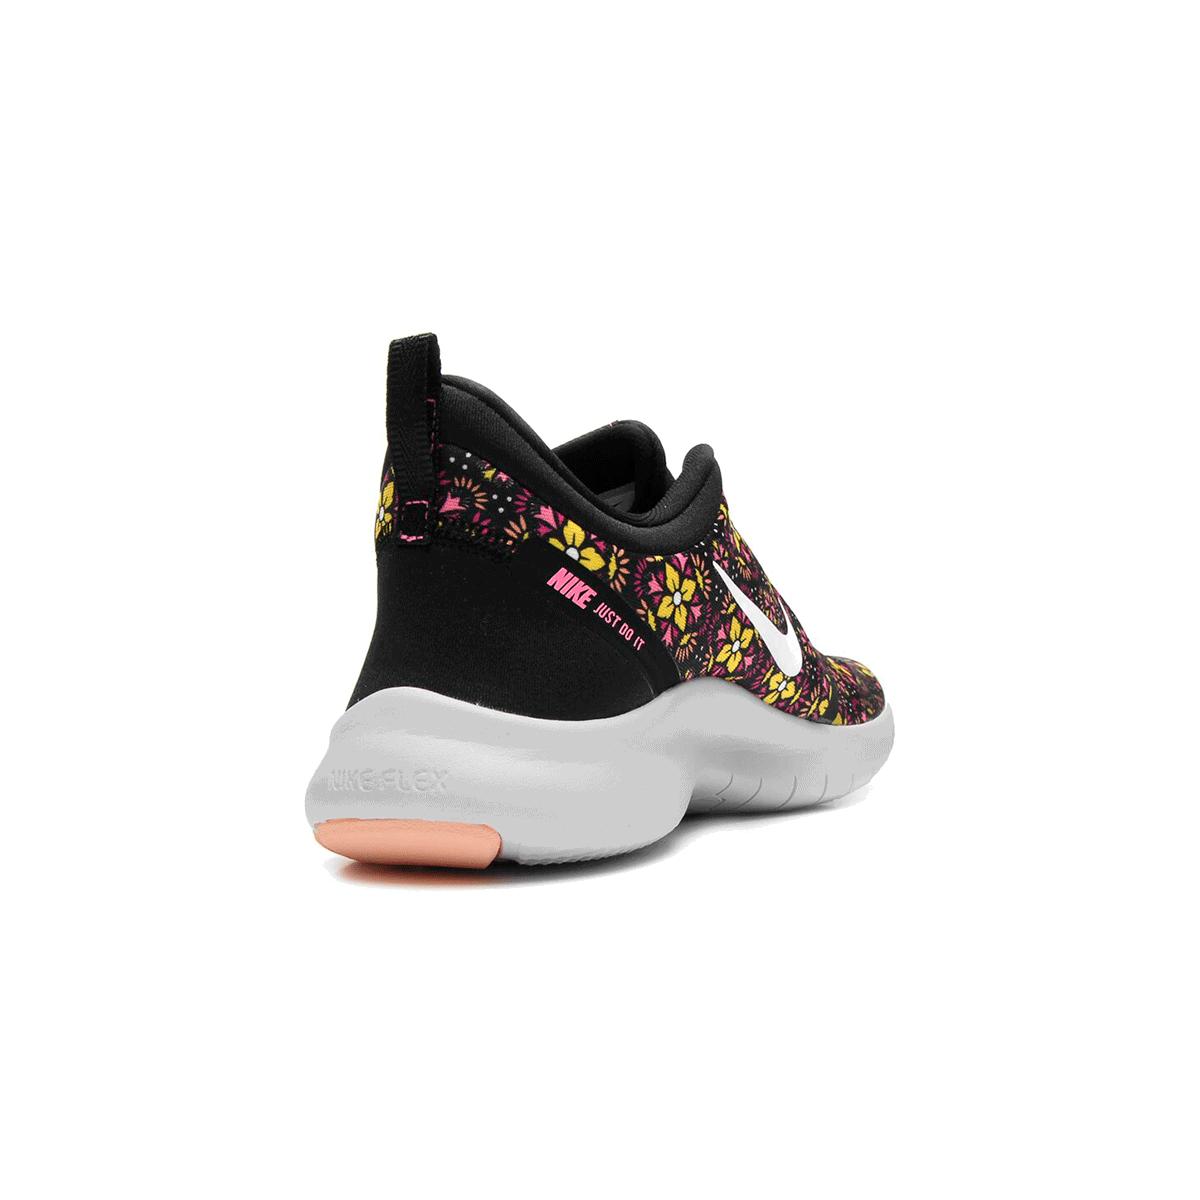 Tênis Nike Flex Experience Run 8 Feminino Preto